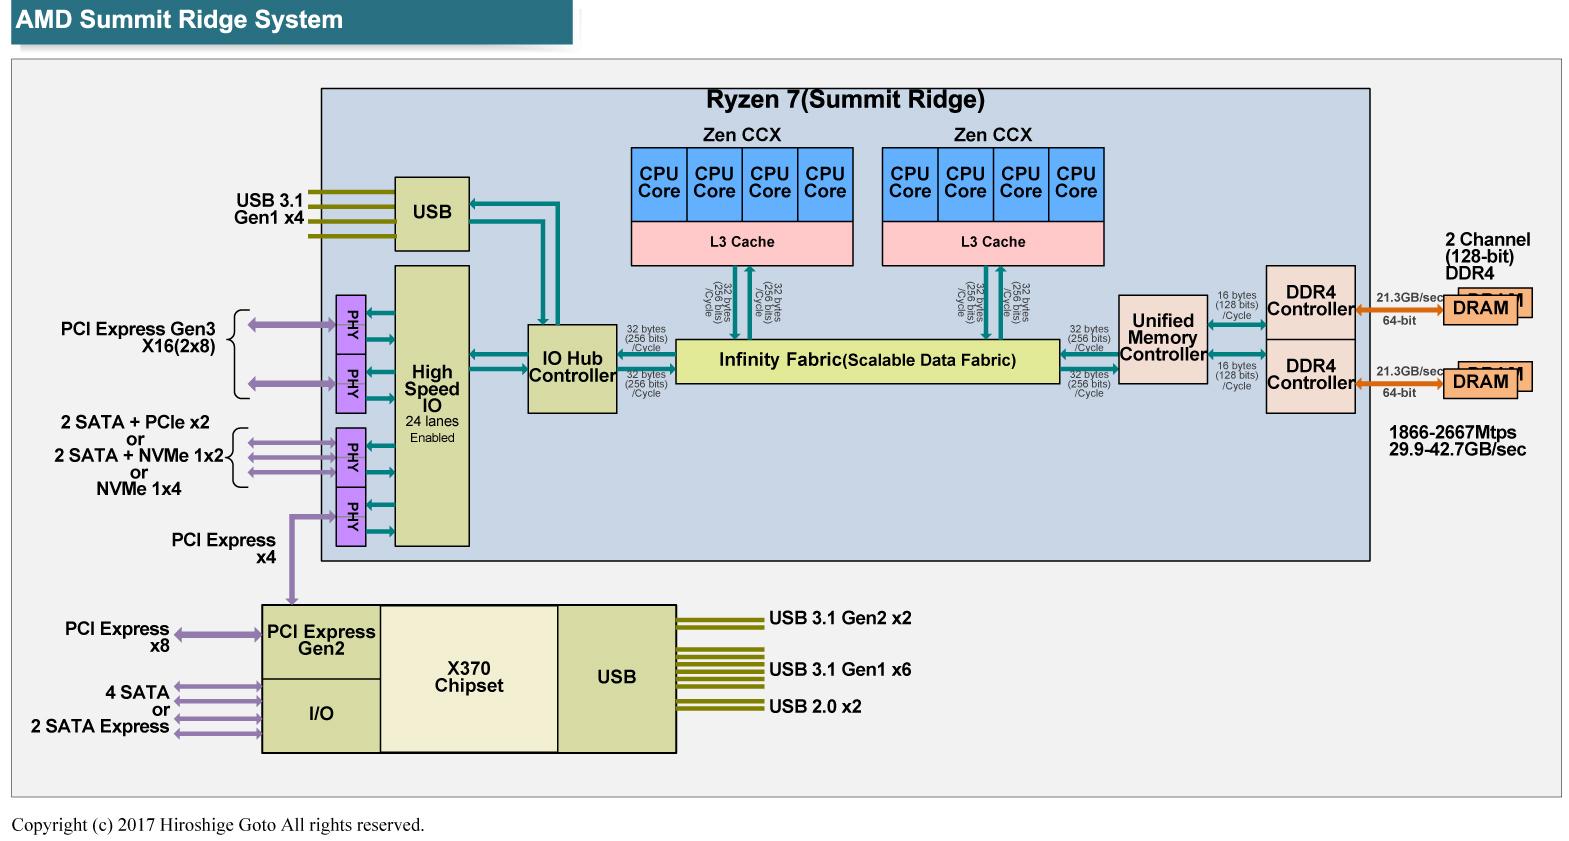 "Ryzen(Summit Ridge)のSoC構成。Infinity Fabricがユニットを接続する<BR>(PDF版は<span class=""img-inline raw""><a href="""" ipw_status=""1"" ipw_linktype=""filelink_raw"" class=""resource"">こちら</a></span>)"